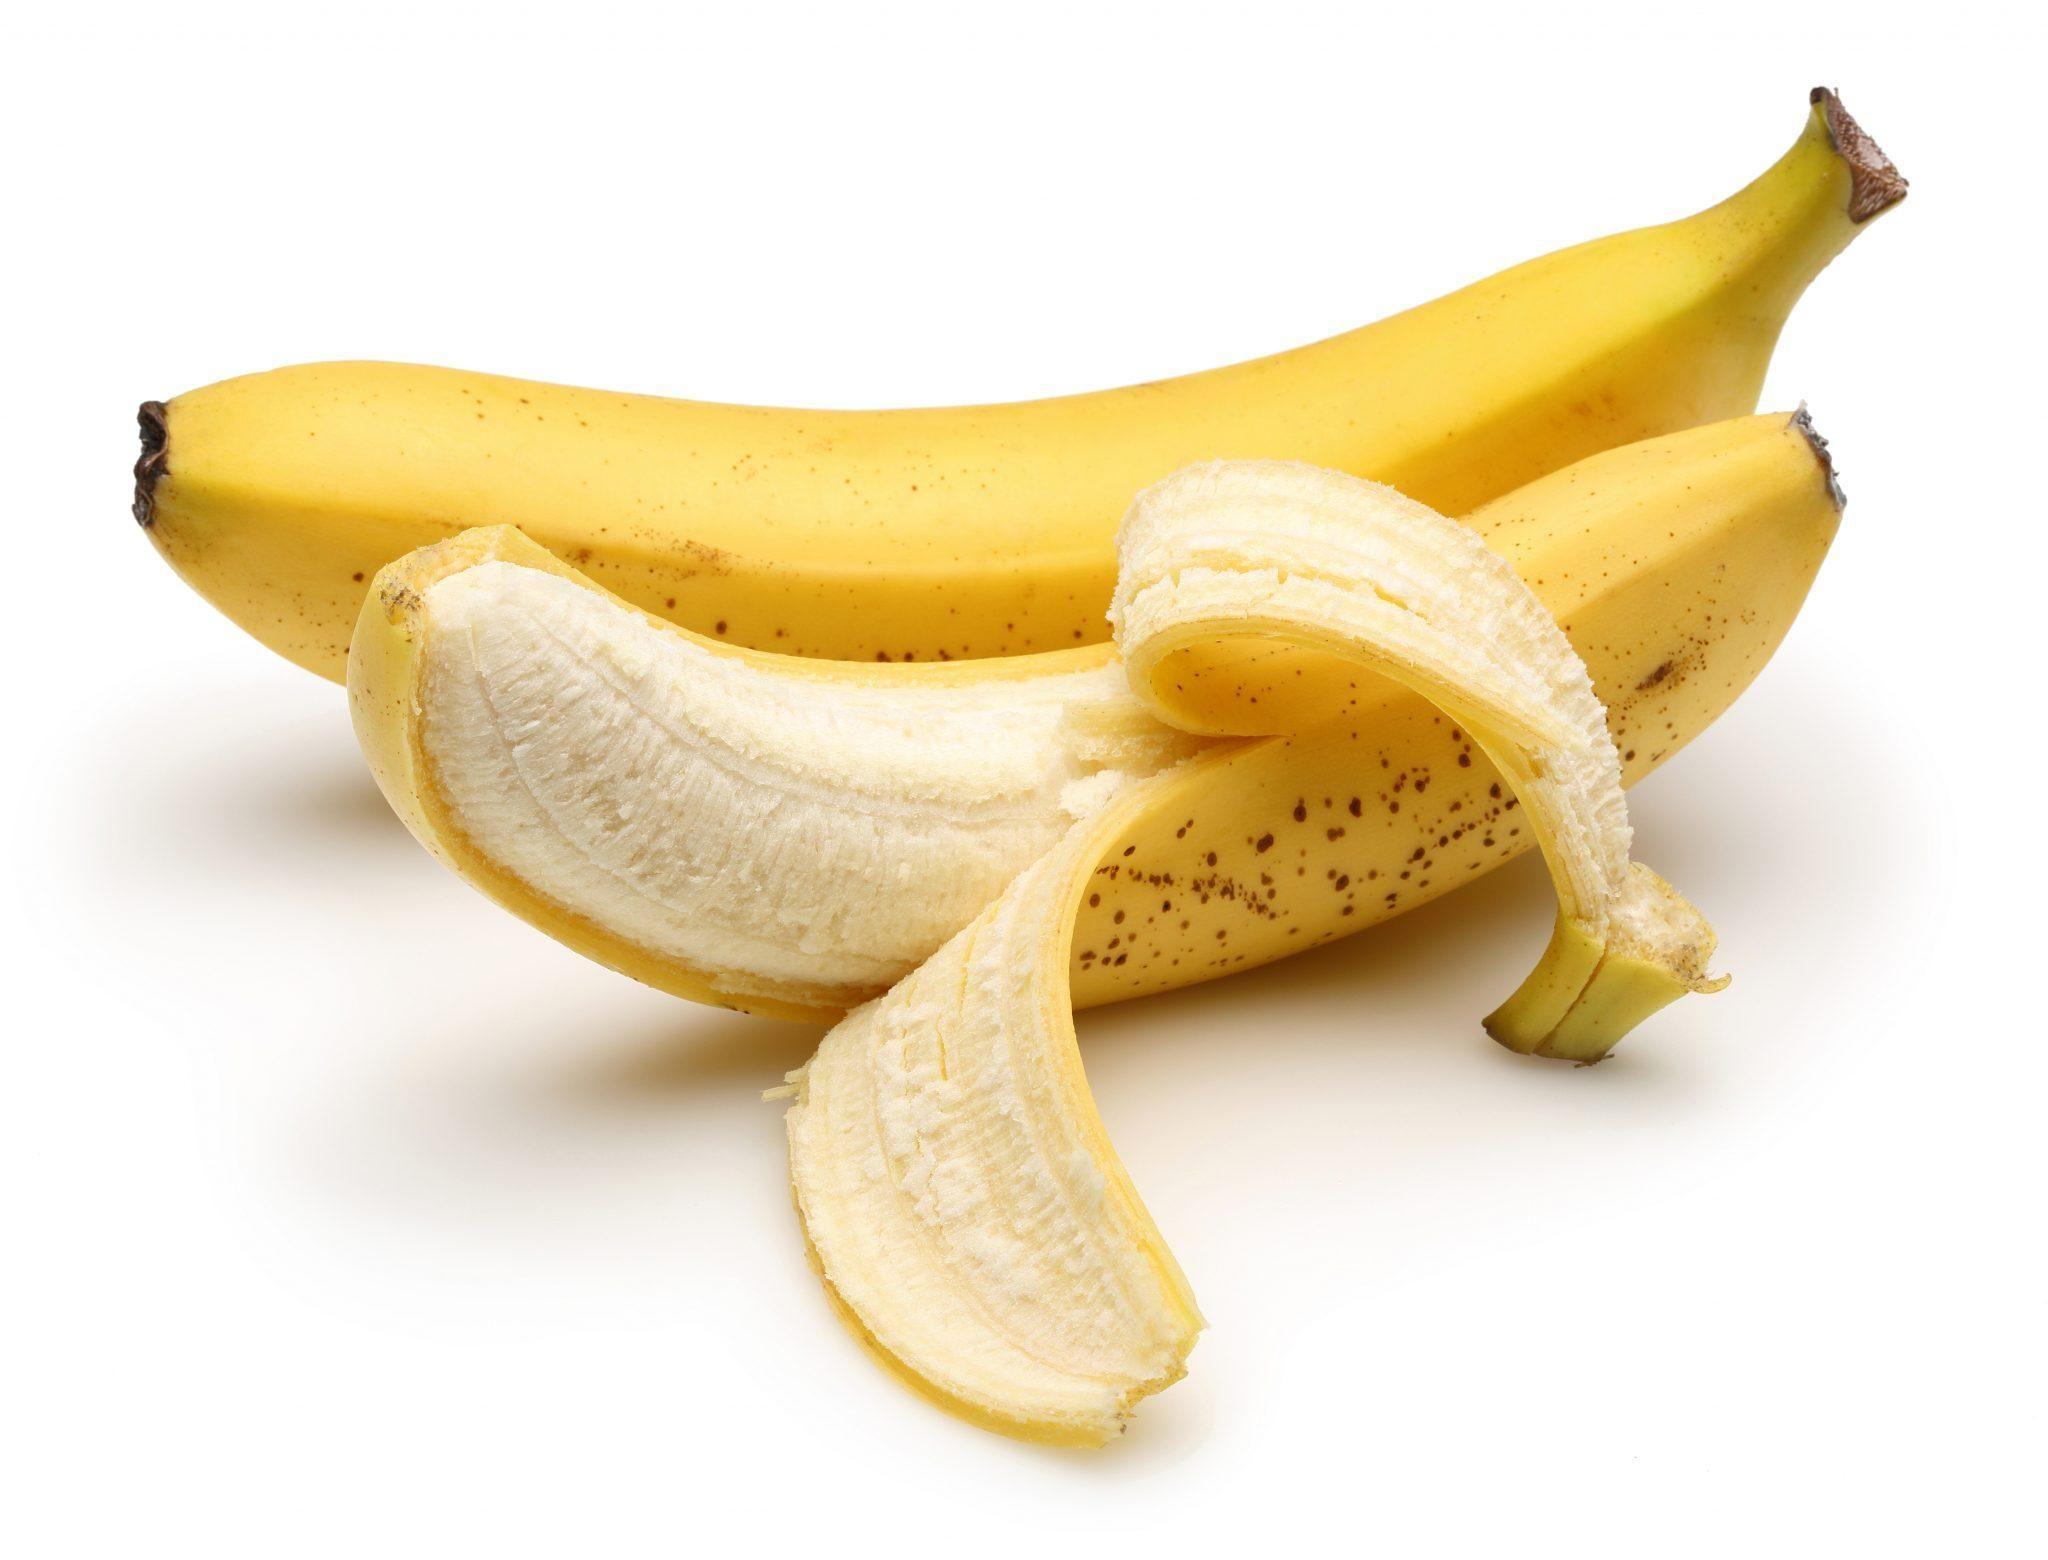 Do Bananas Raise Blood Sugar Levels?